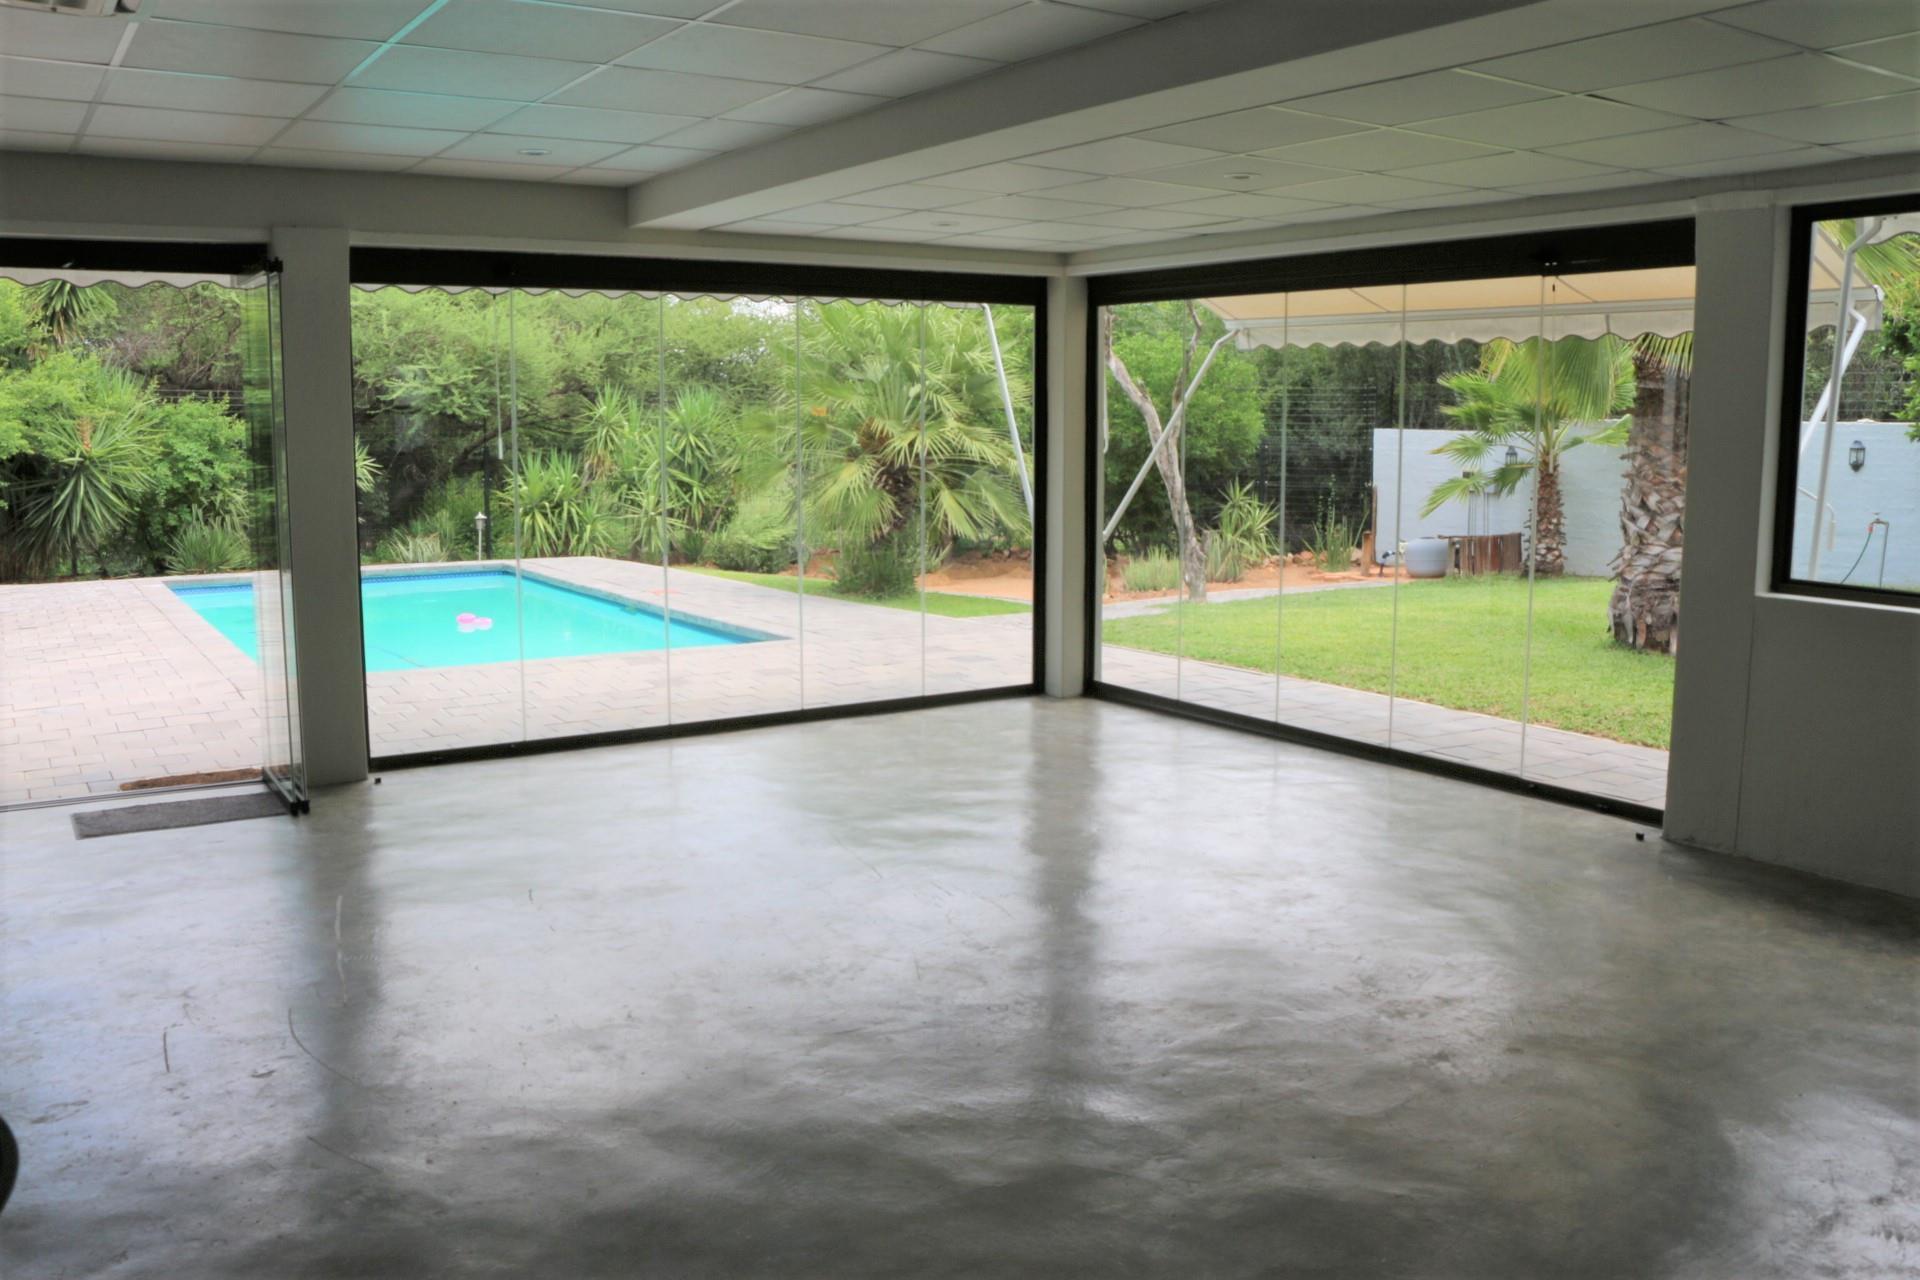 3 Bedroom House For Sale in Mokolodi 1